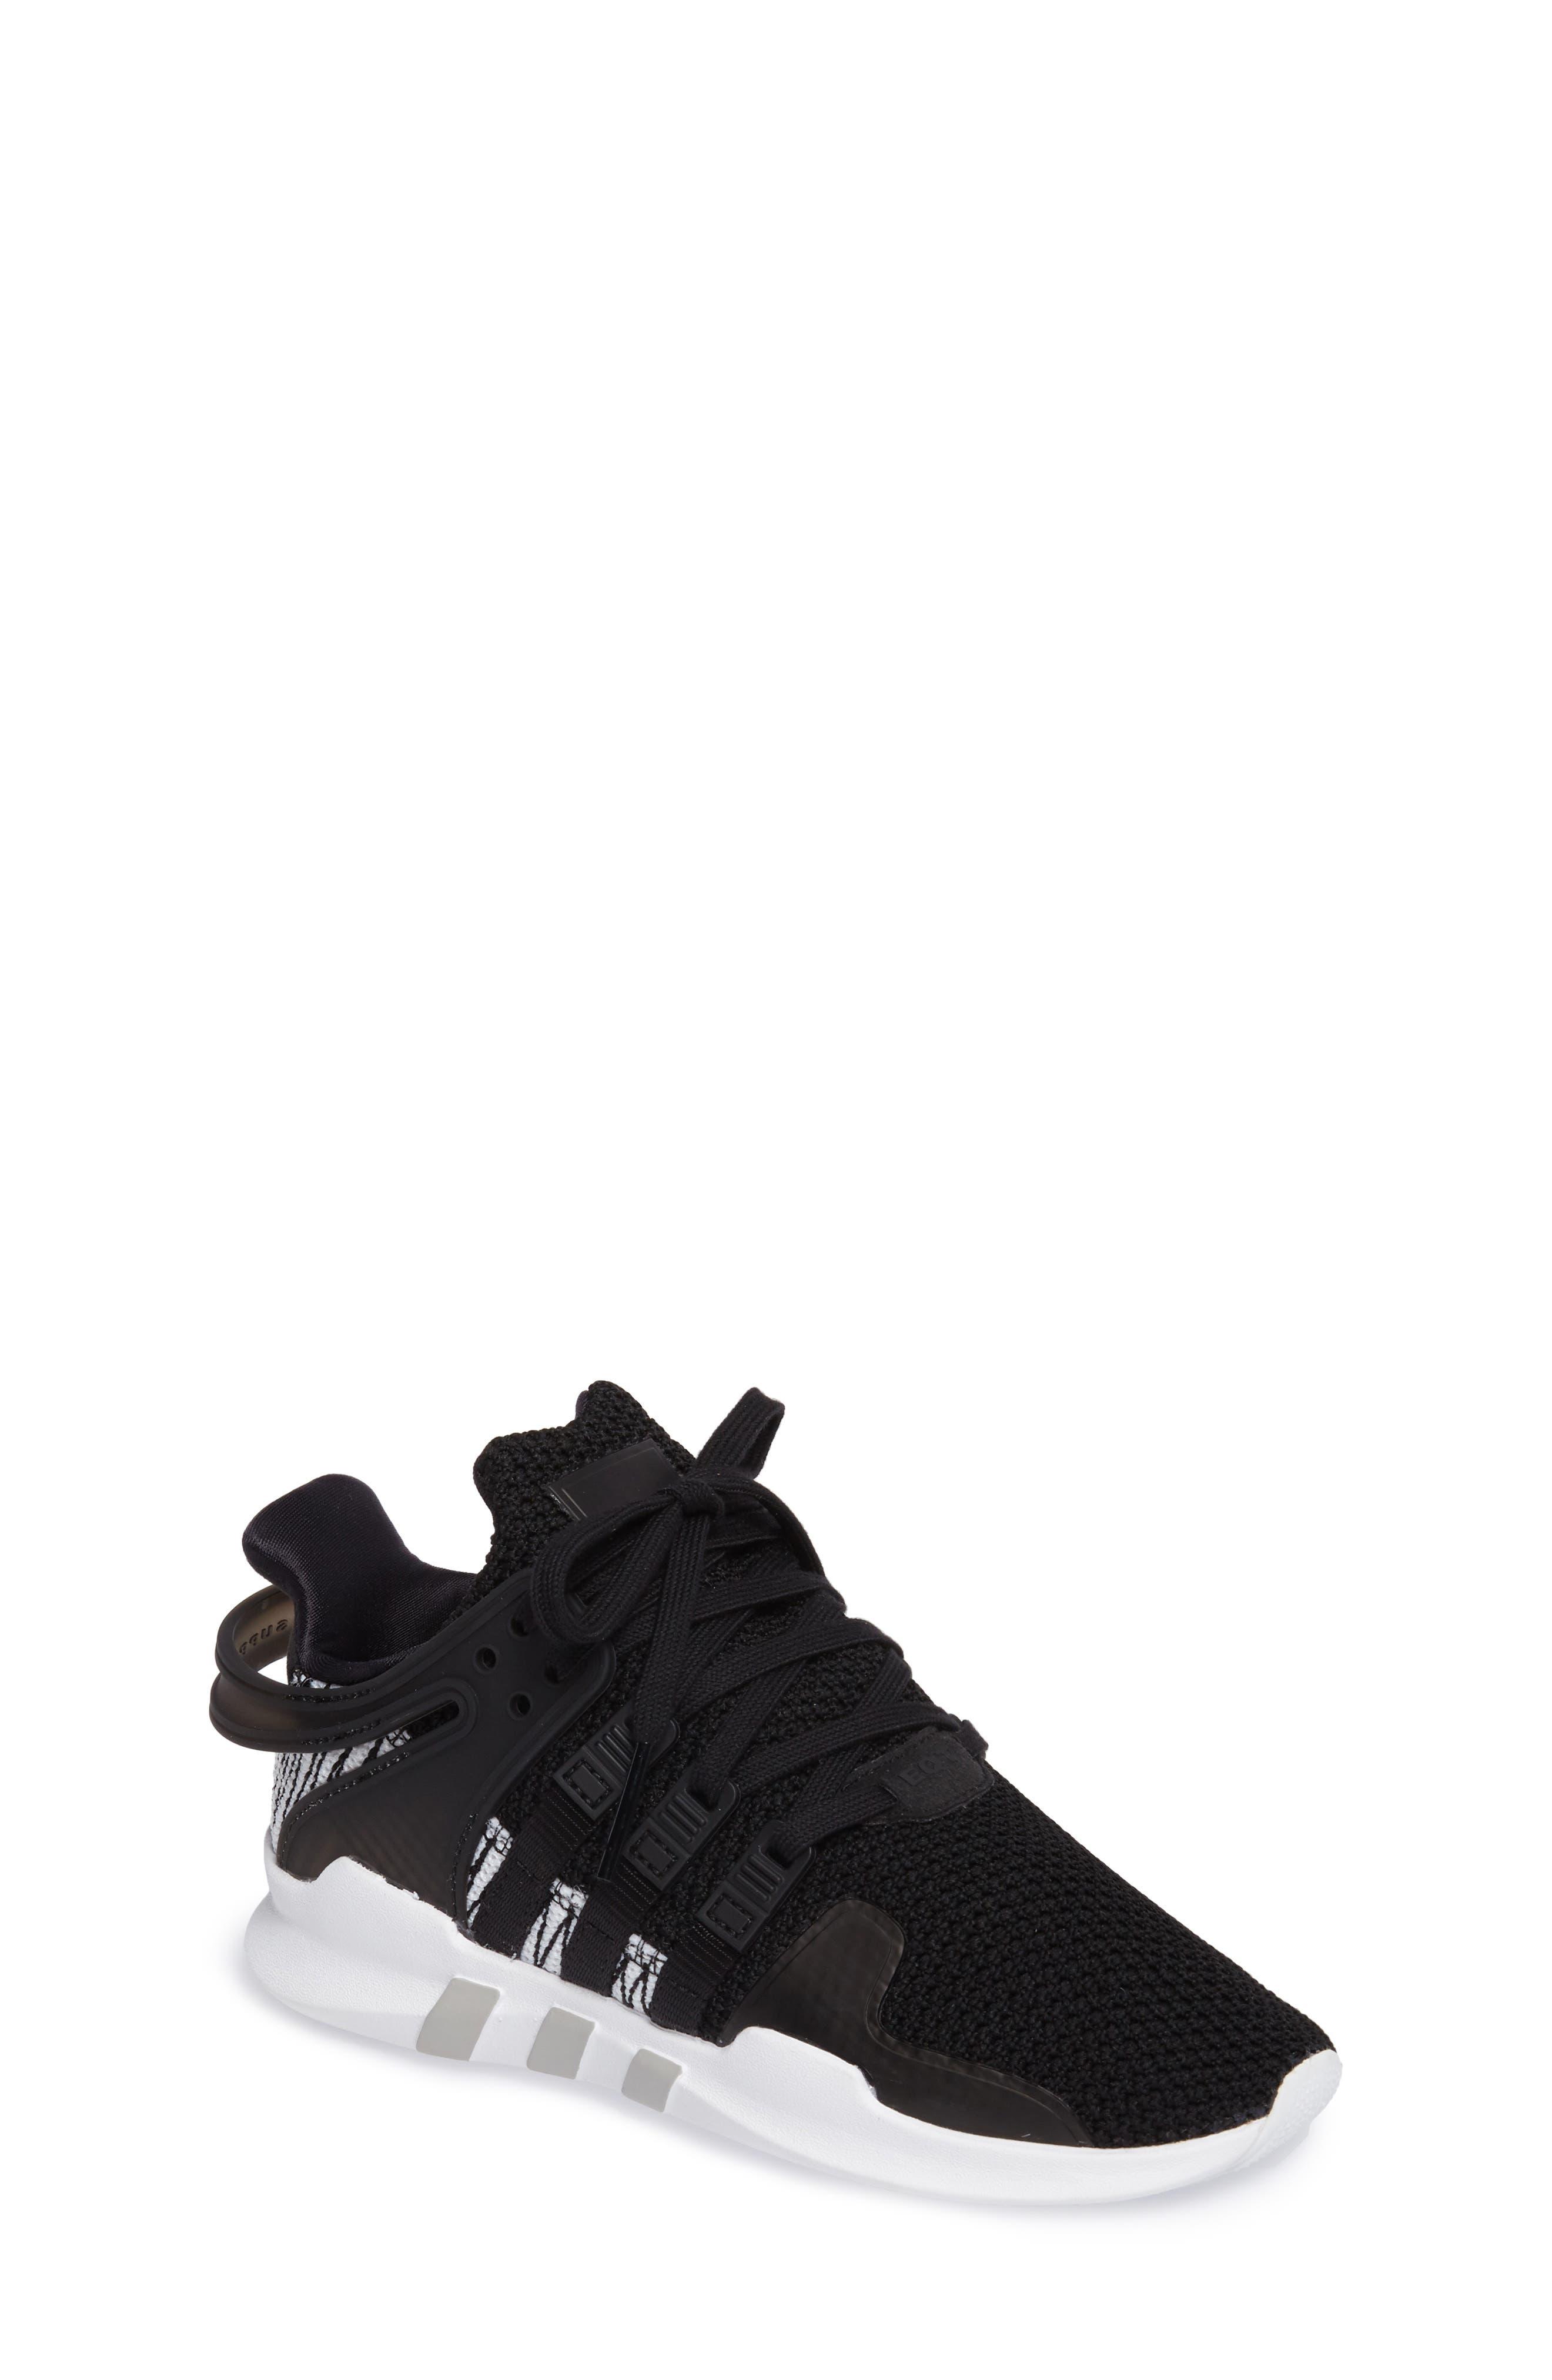 ADIDAS EQT Support ADV C Sneaker